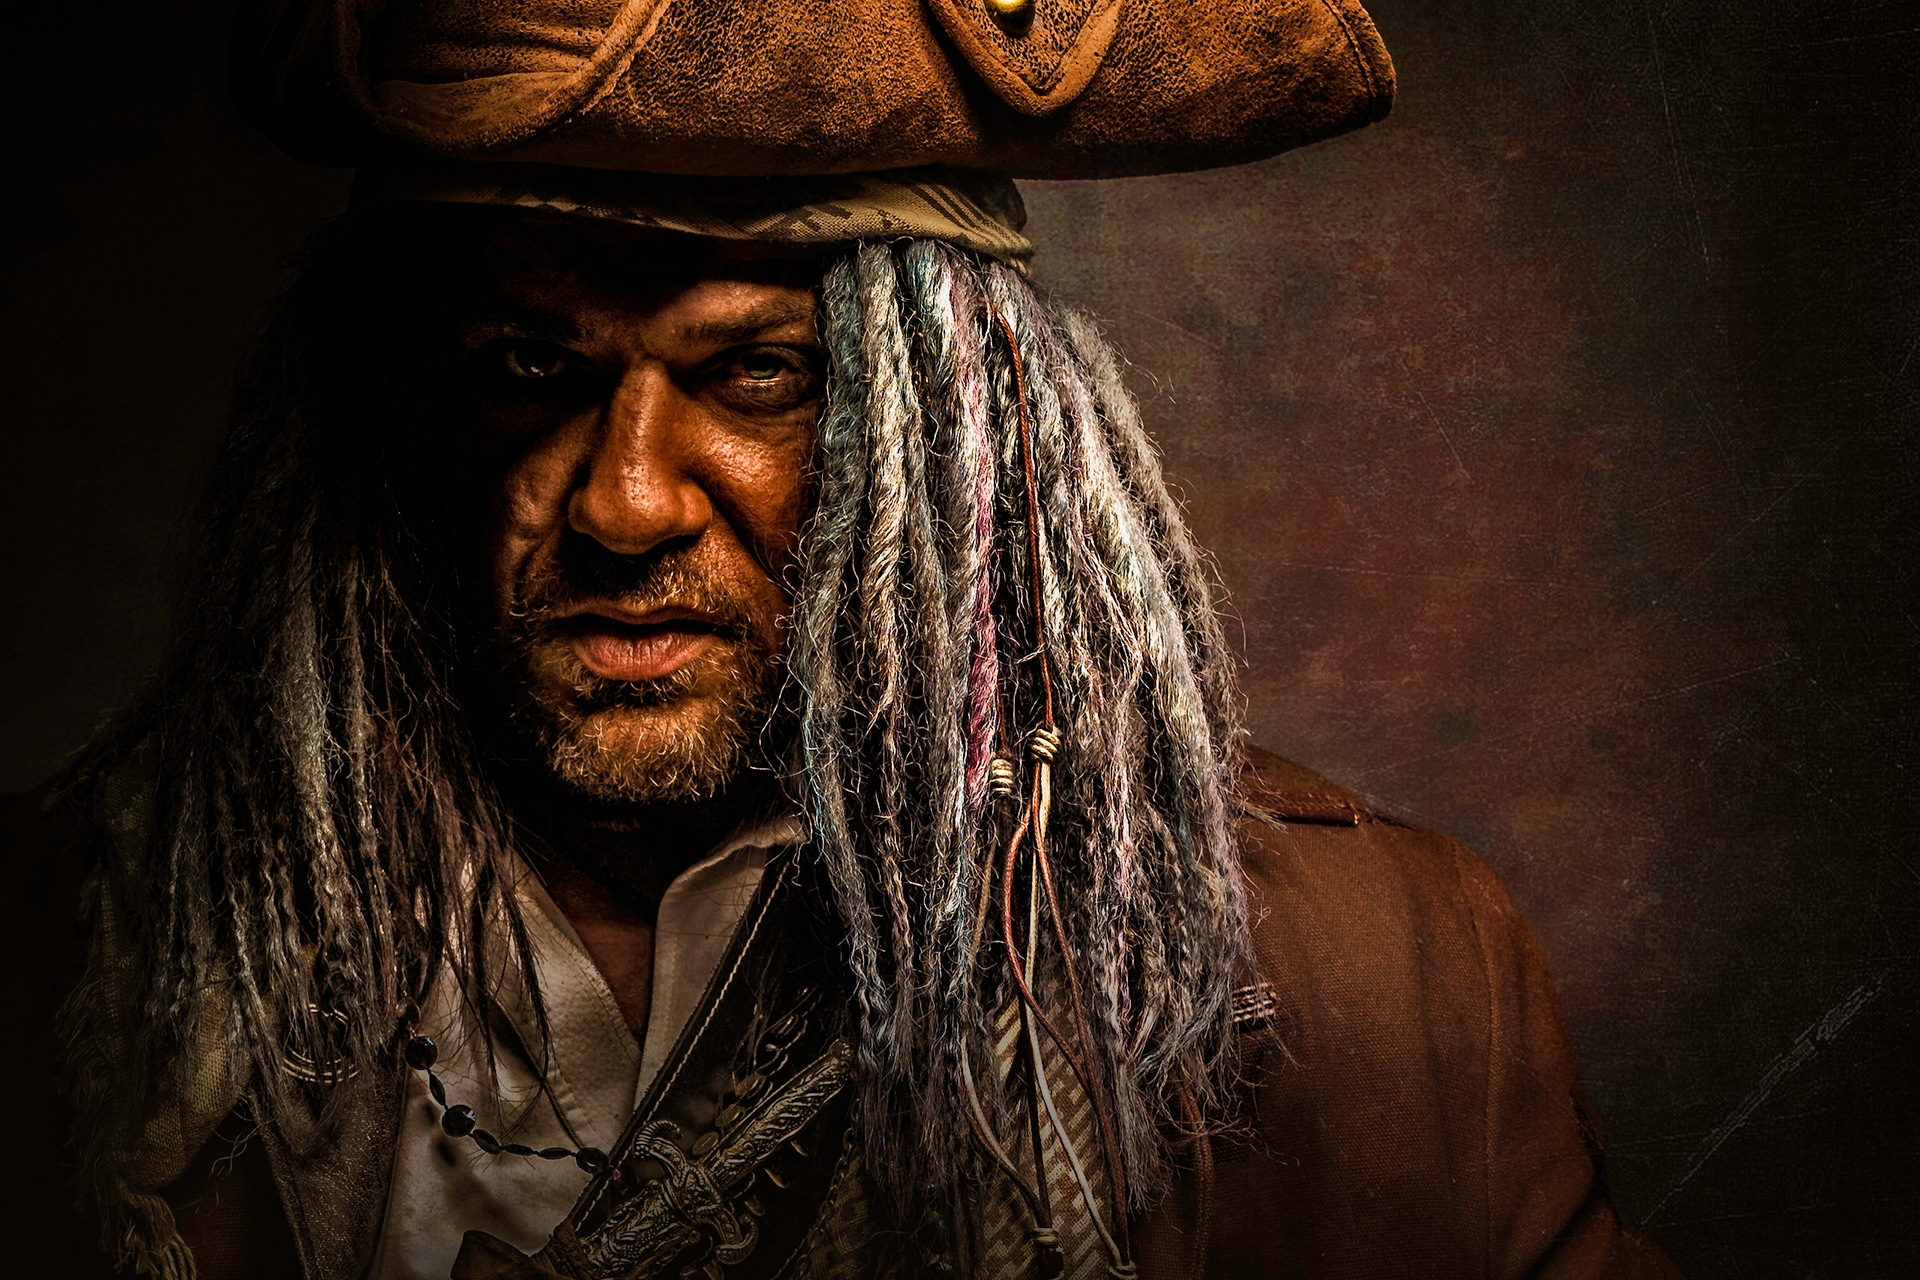 Dark Pirate by Sascha Feldt